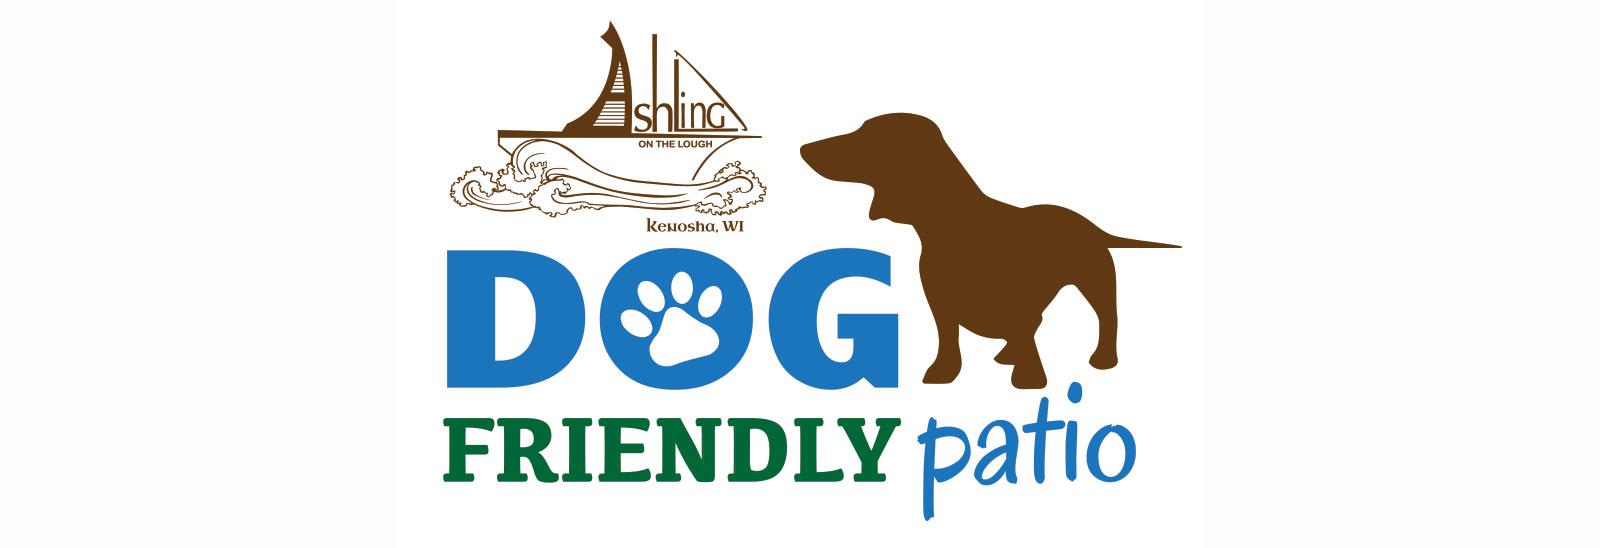 Ashling-Dog-Friendly-Patio-1